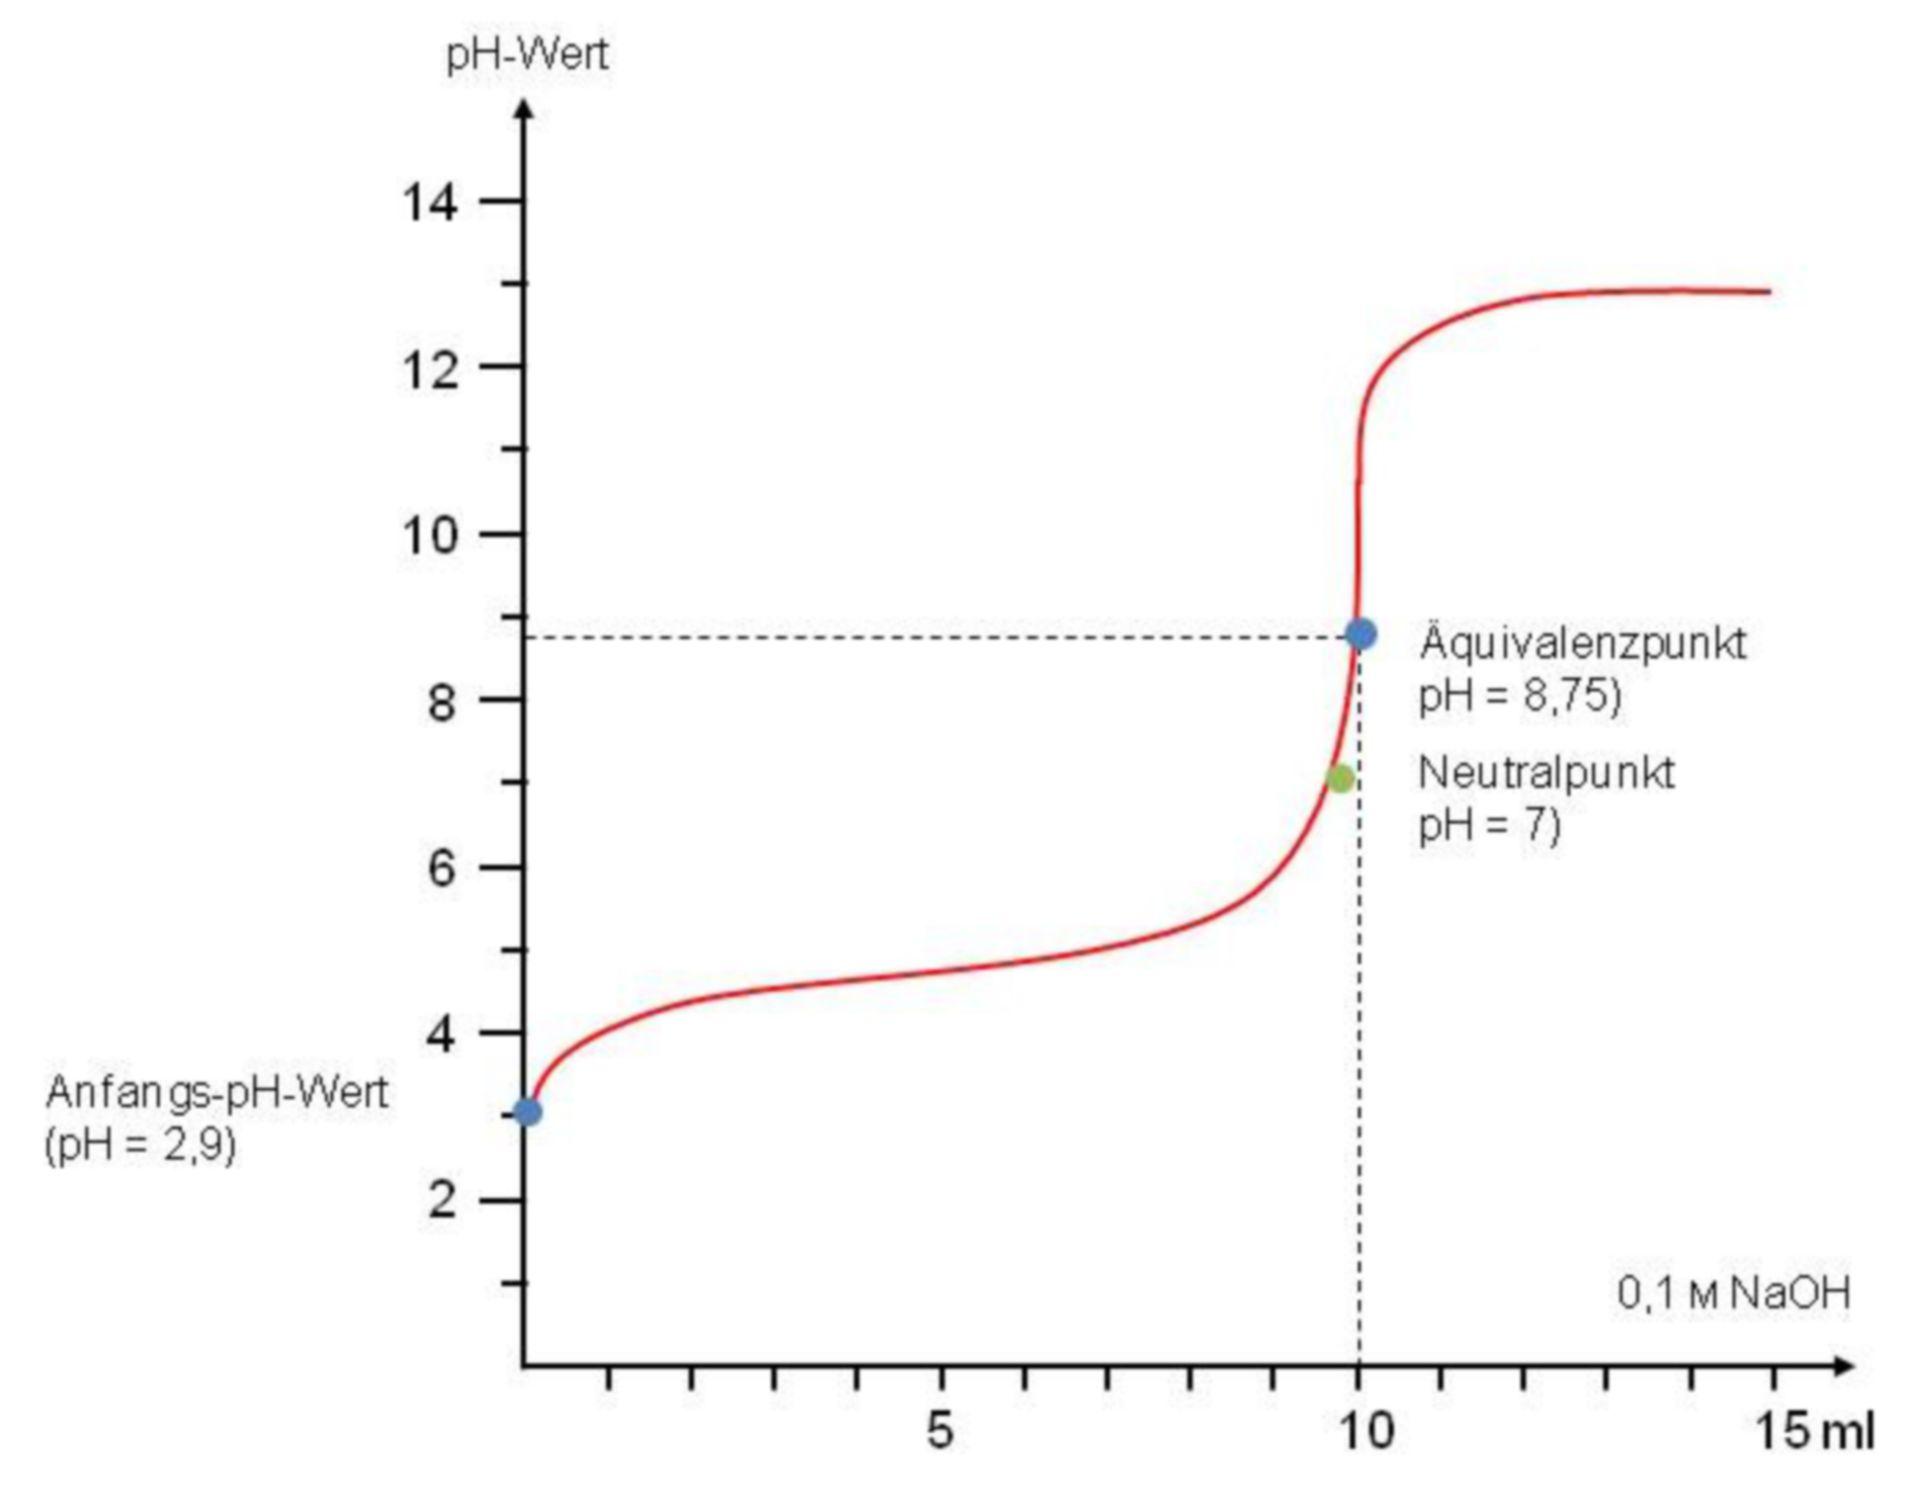 Titration curve of hydrochloric acid